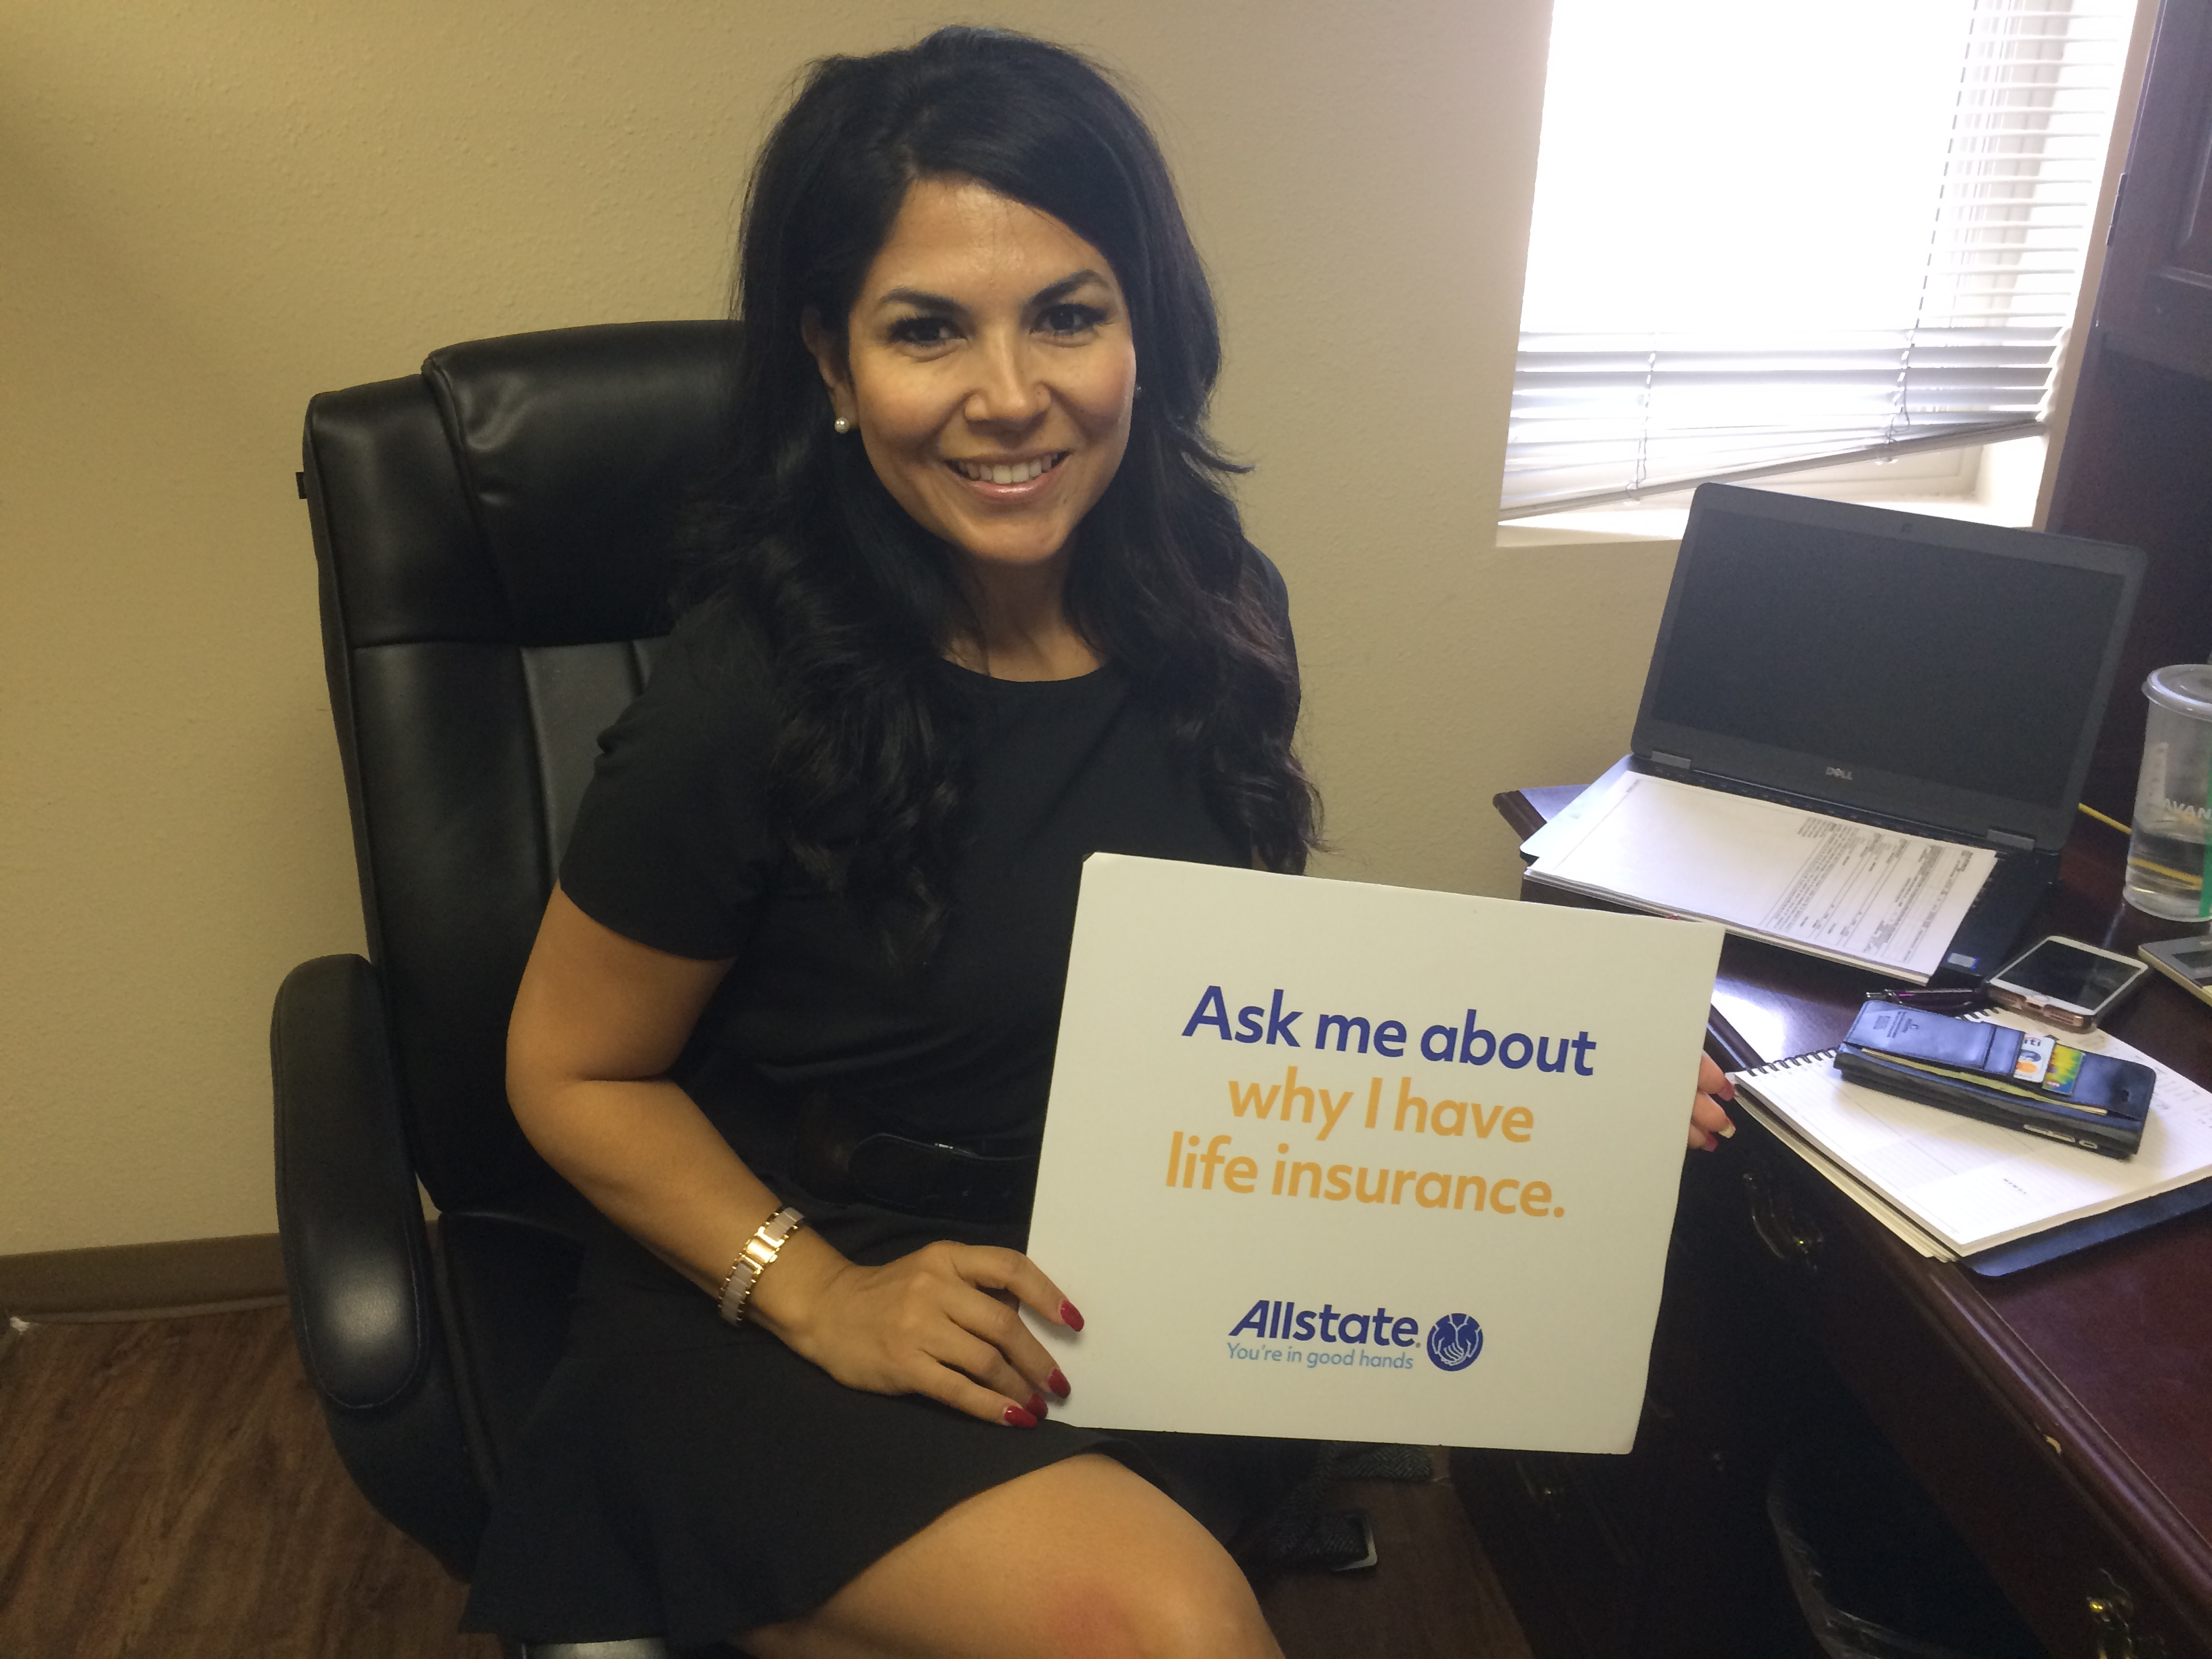 Carolina Gutierrez: Allstate Insurance image 1